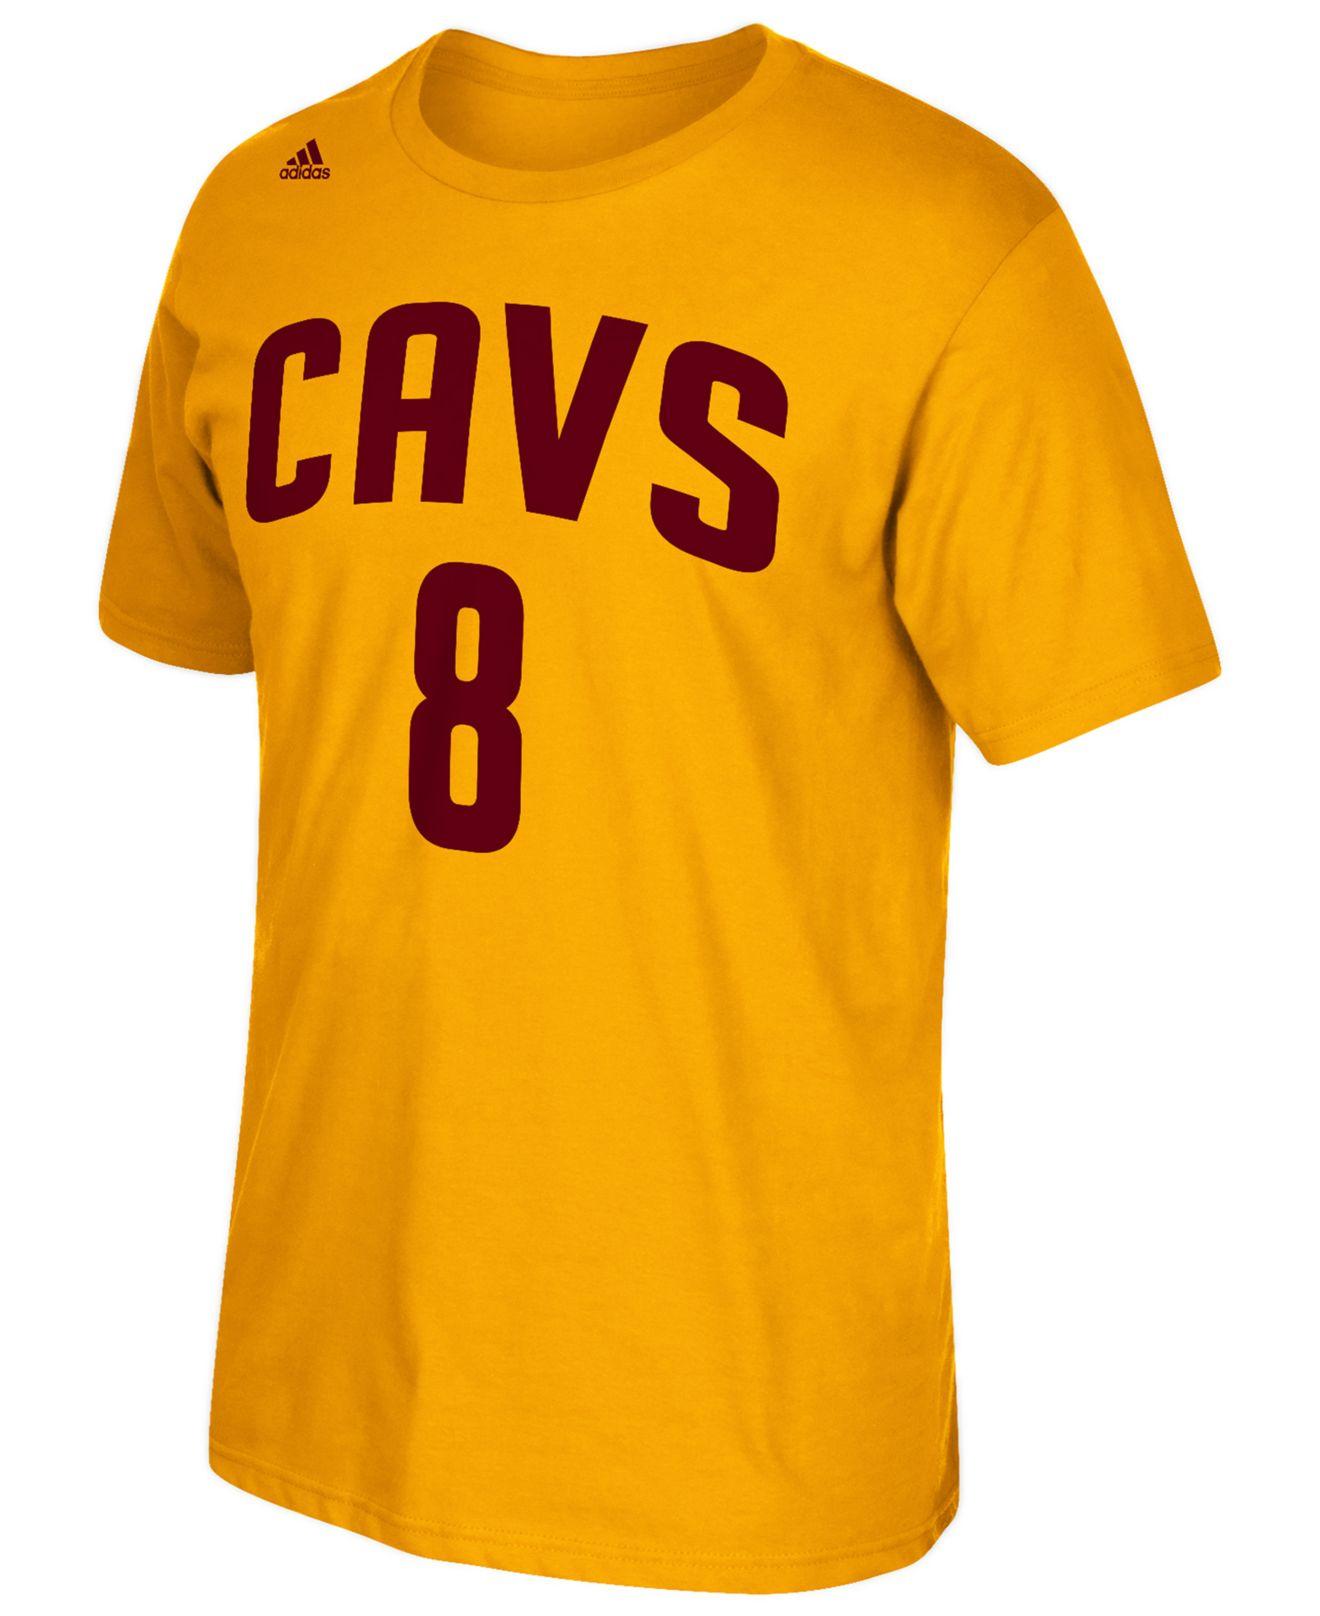 e59d9ed861b adidas Men s Matthew Dellavedova Cleveland Cavaliers Player T-shirt ...